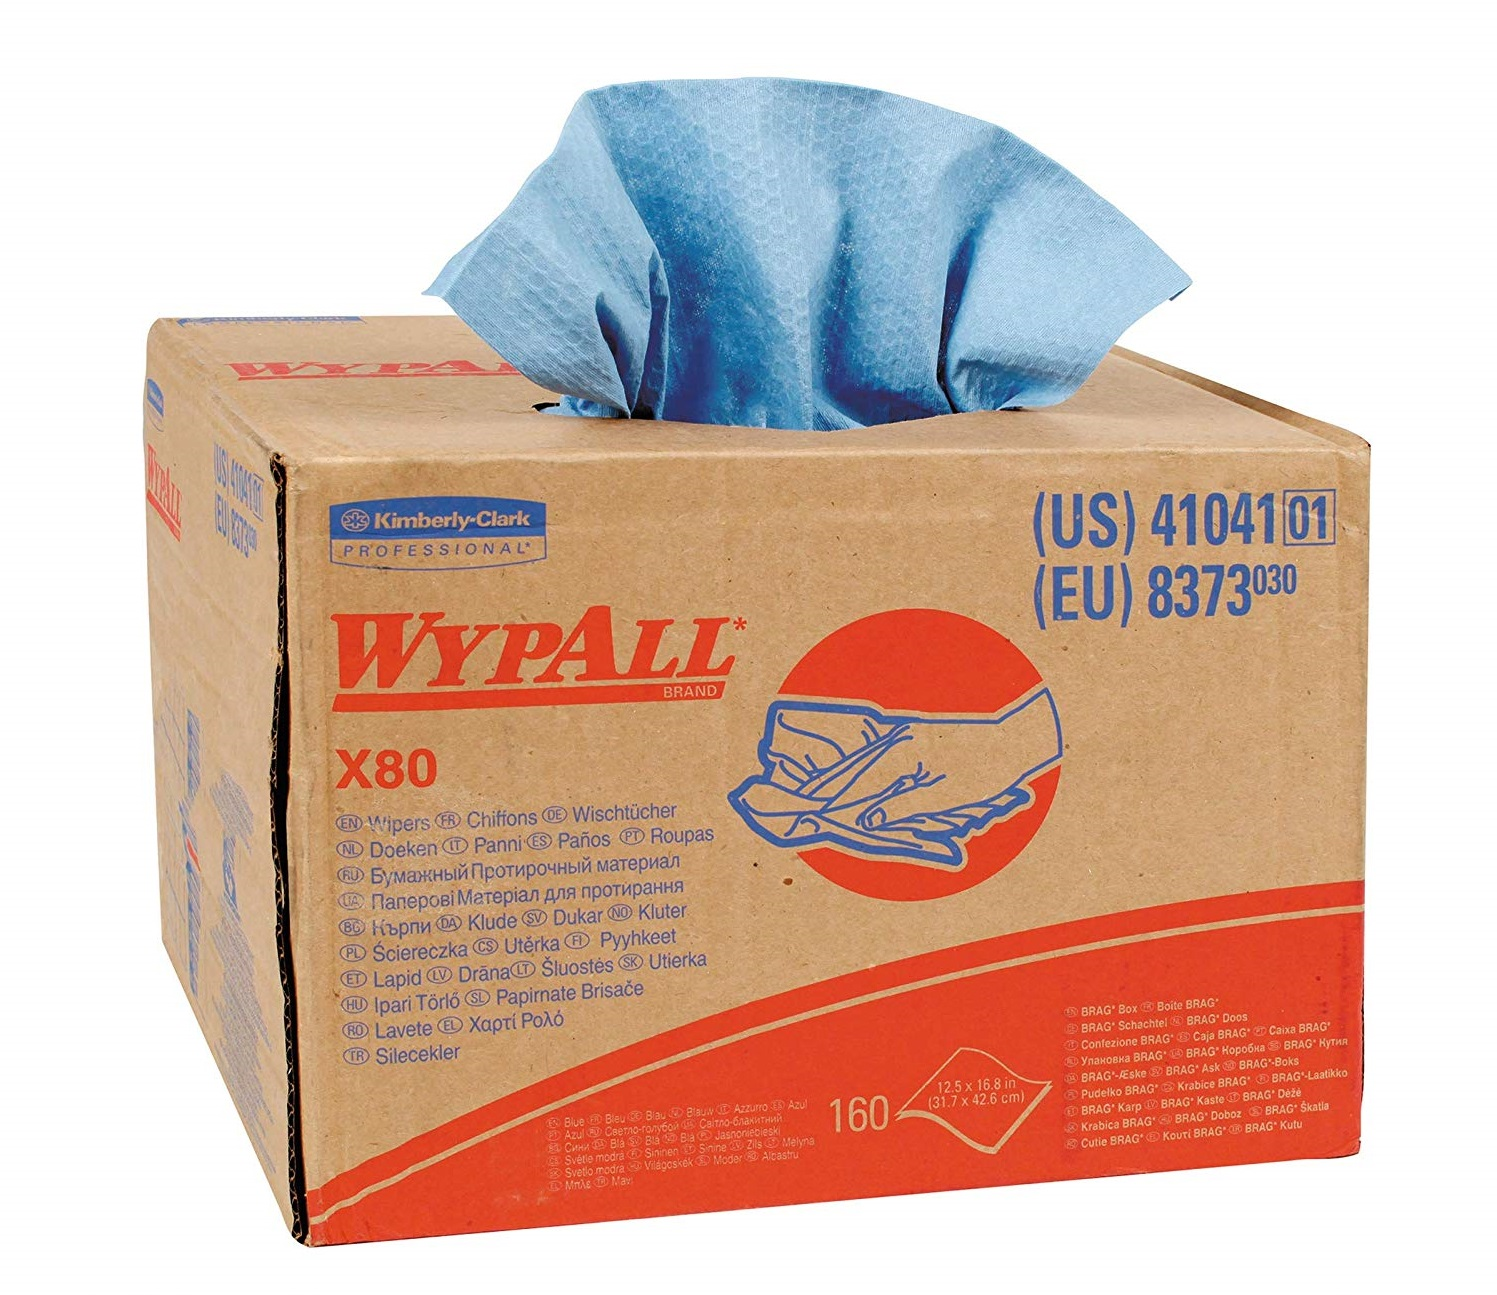 Wypall X80 - Brag Blue 160/box